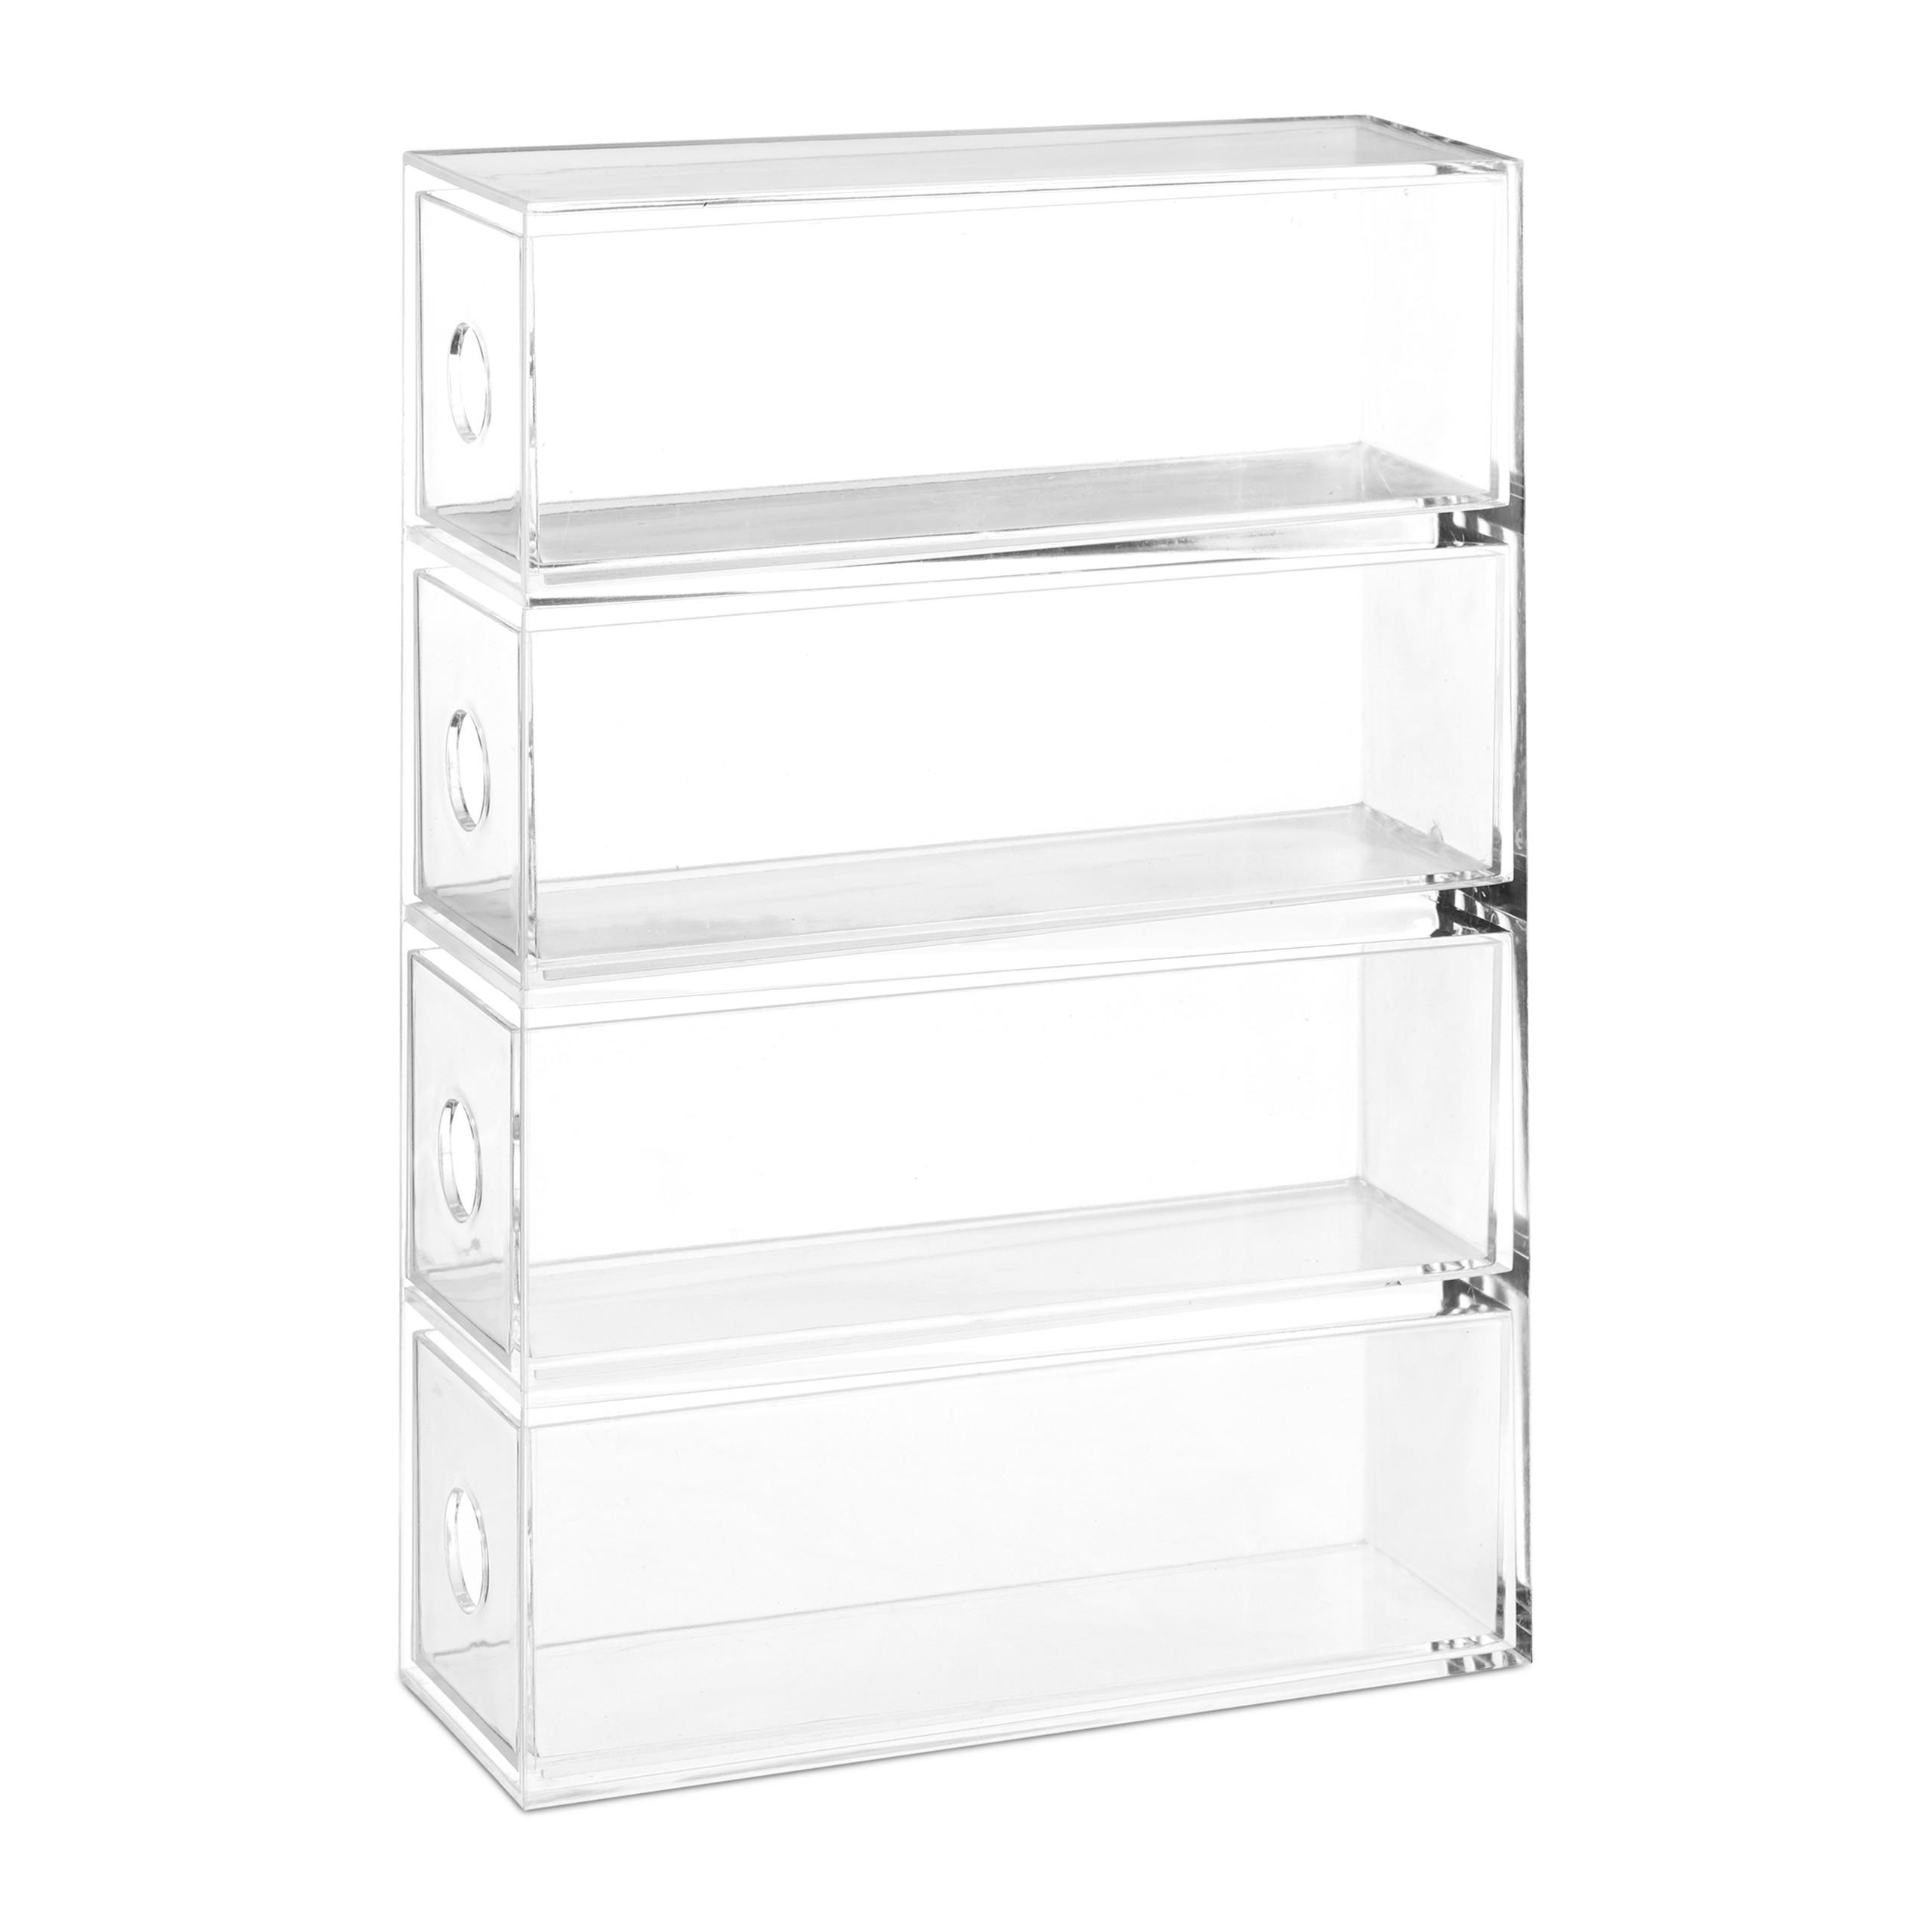 Transparent-Make-Up-Organiser-Storage-Box-with-4-Drawers thumbnail 6